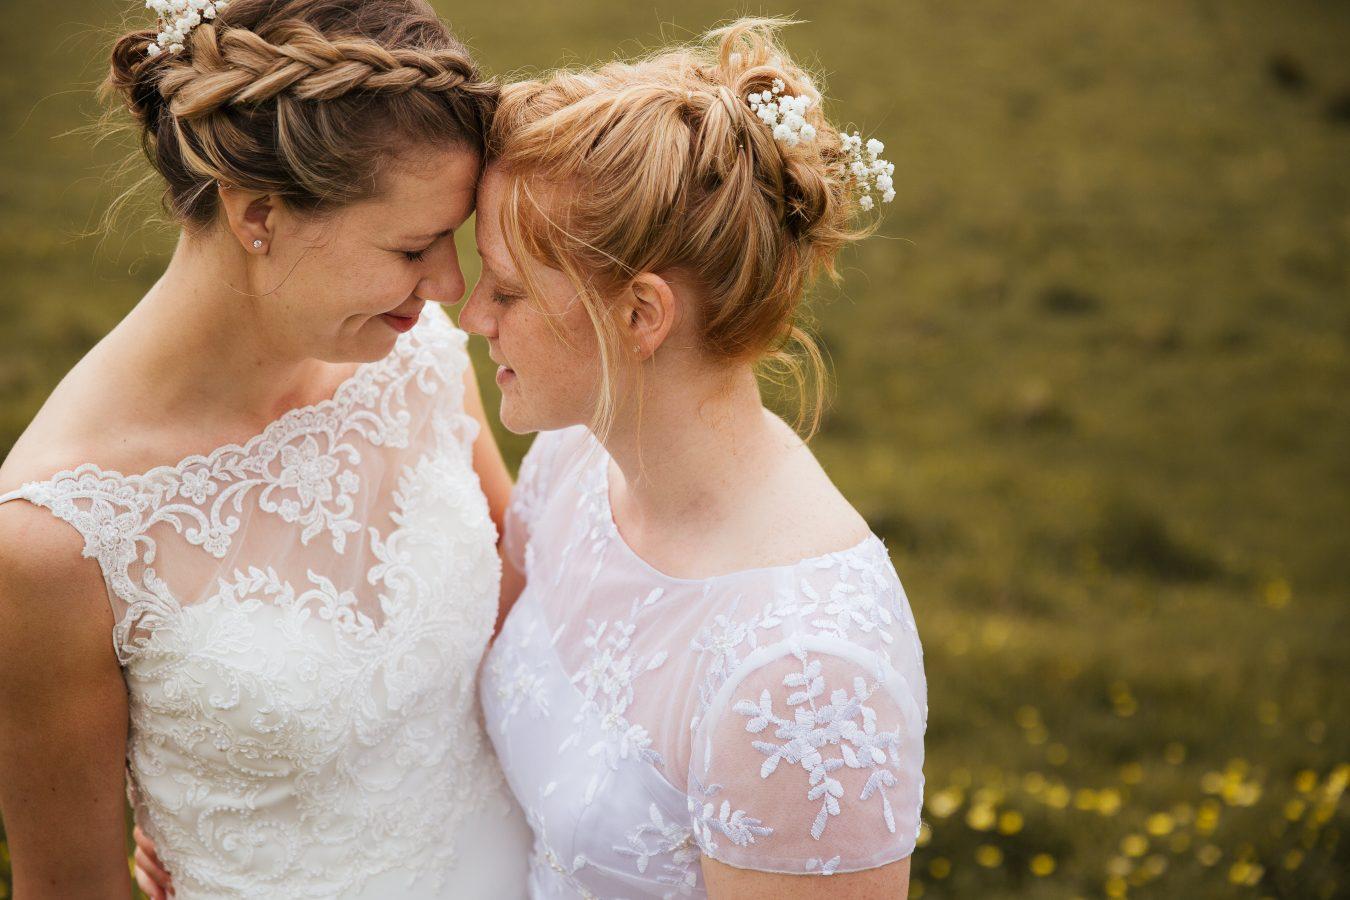 Tregulland-Barns-Wedding-Jules-Barron-Shelley-and-Ali-512